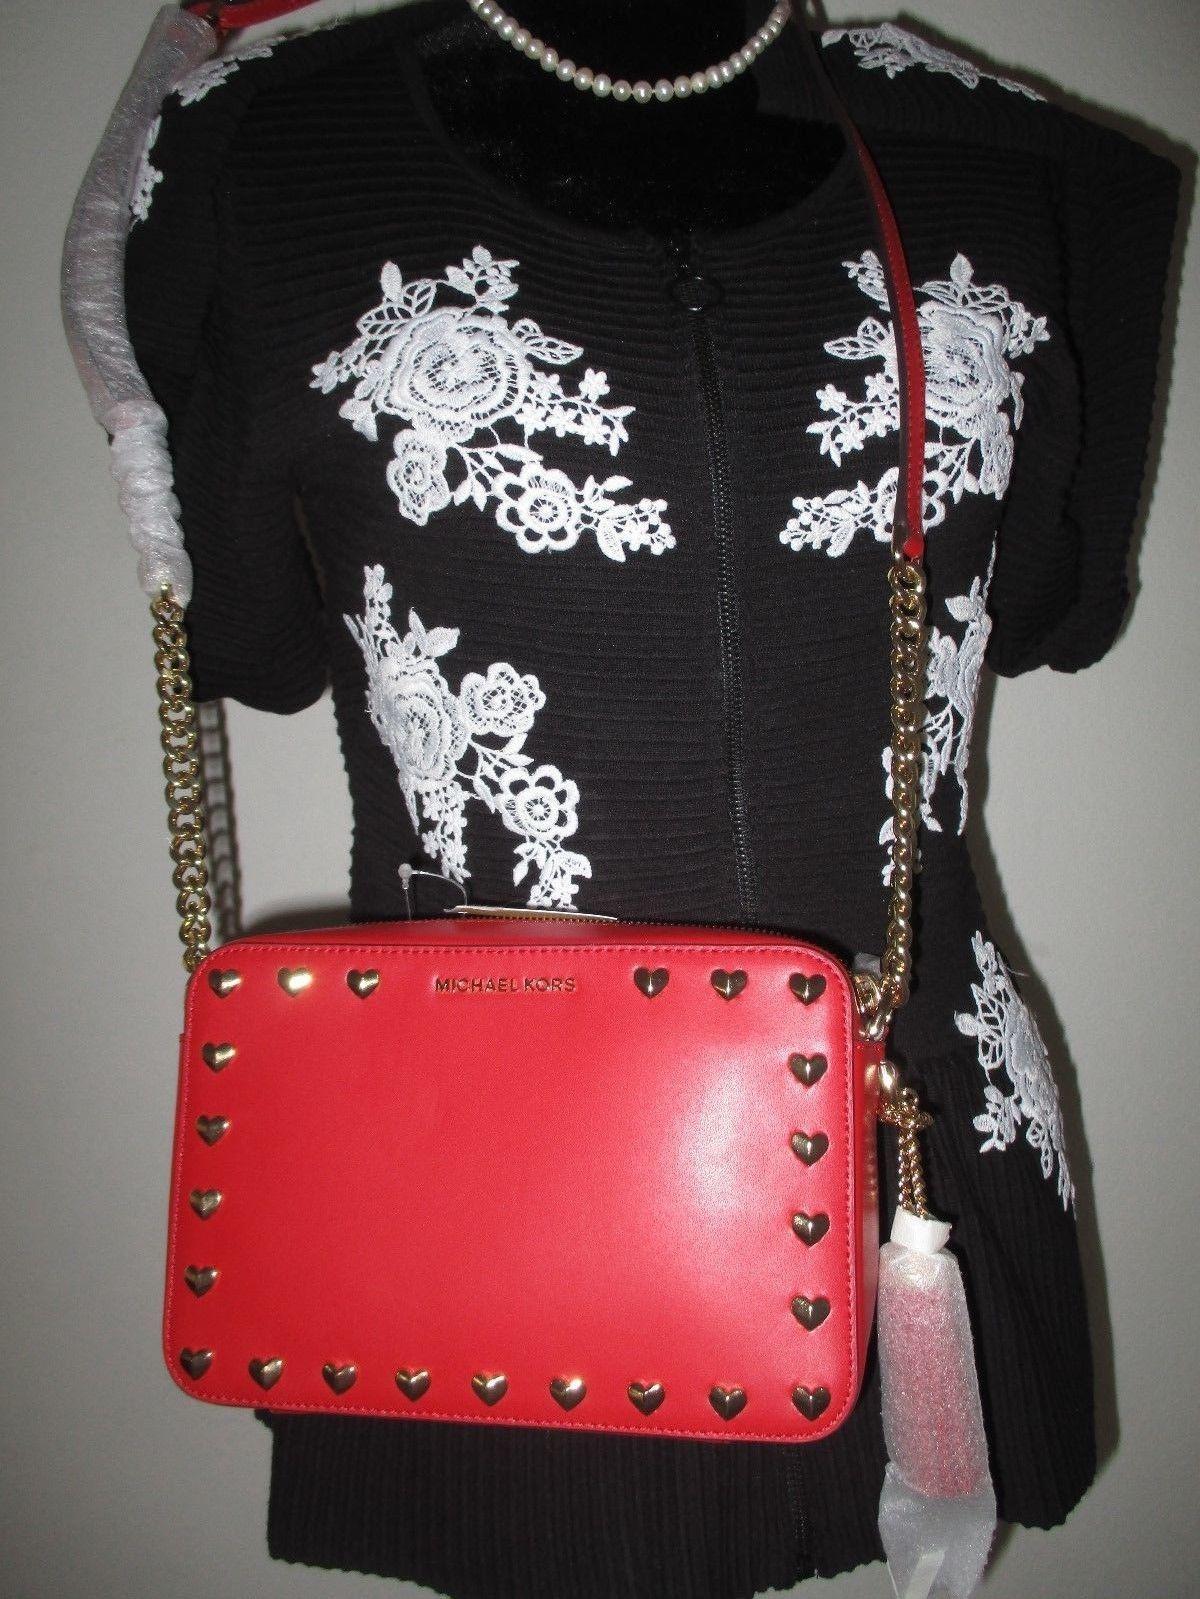 c2ac6a26166c6b MICHAEL KORS Ginny Medium Camera Bag Red Gold Hearts Crossbody ...